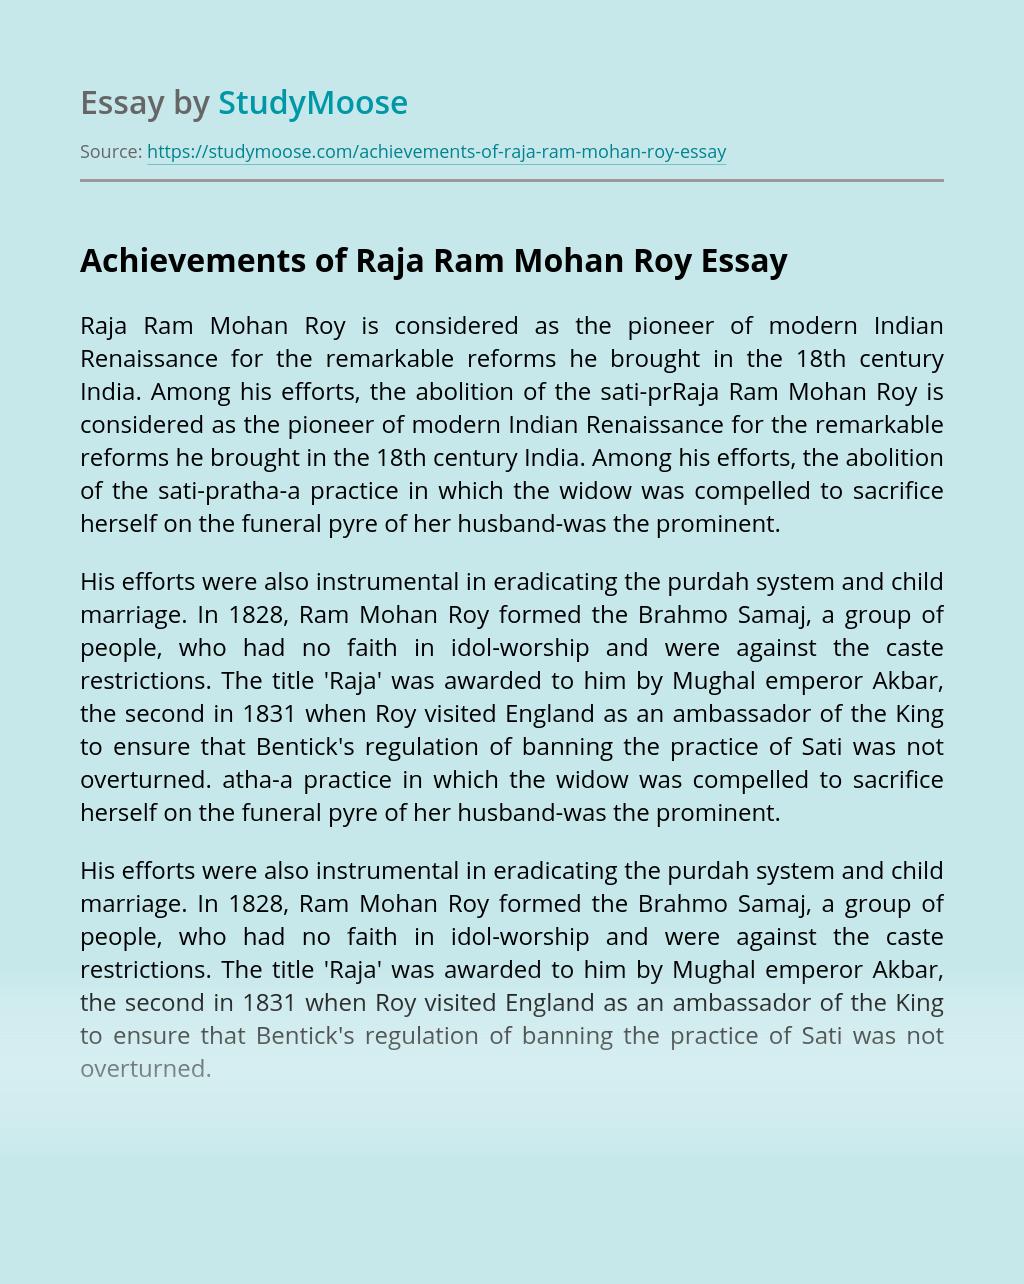 Achievements of Raja Ram Mohan Roy